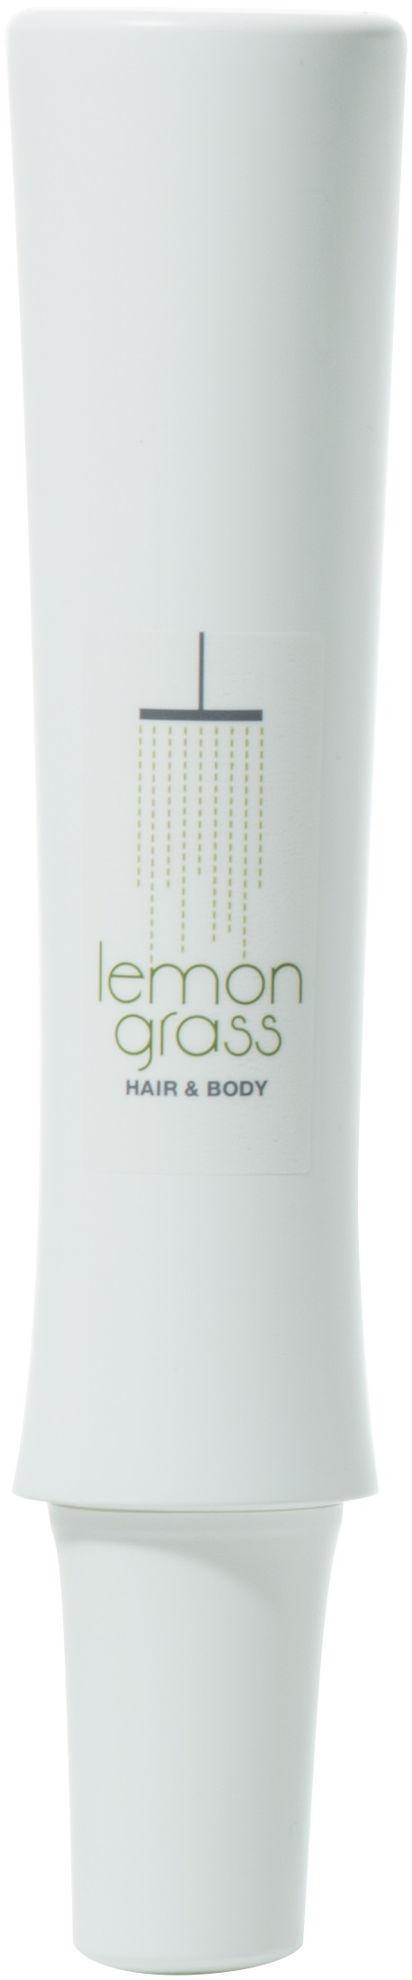 Picture of Shower Maid Hand & Body Lemongrass 215ml